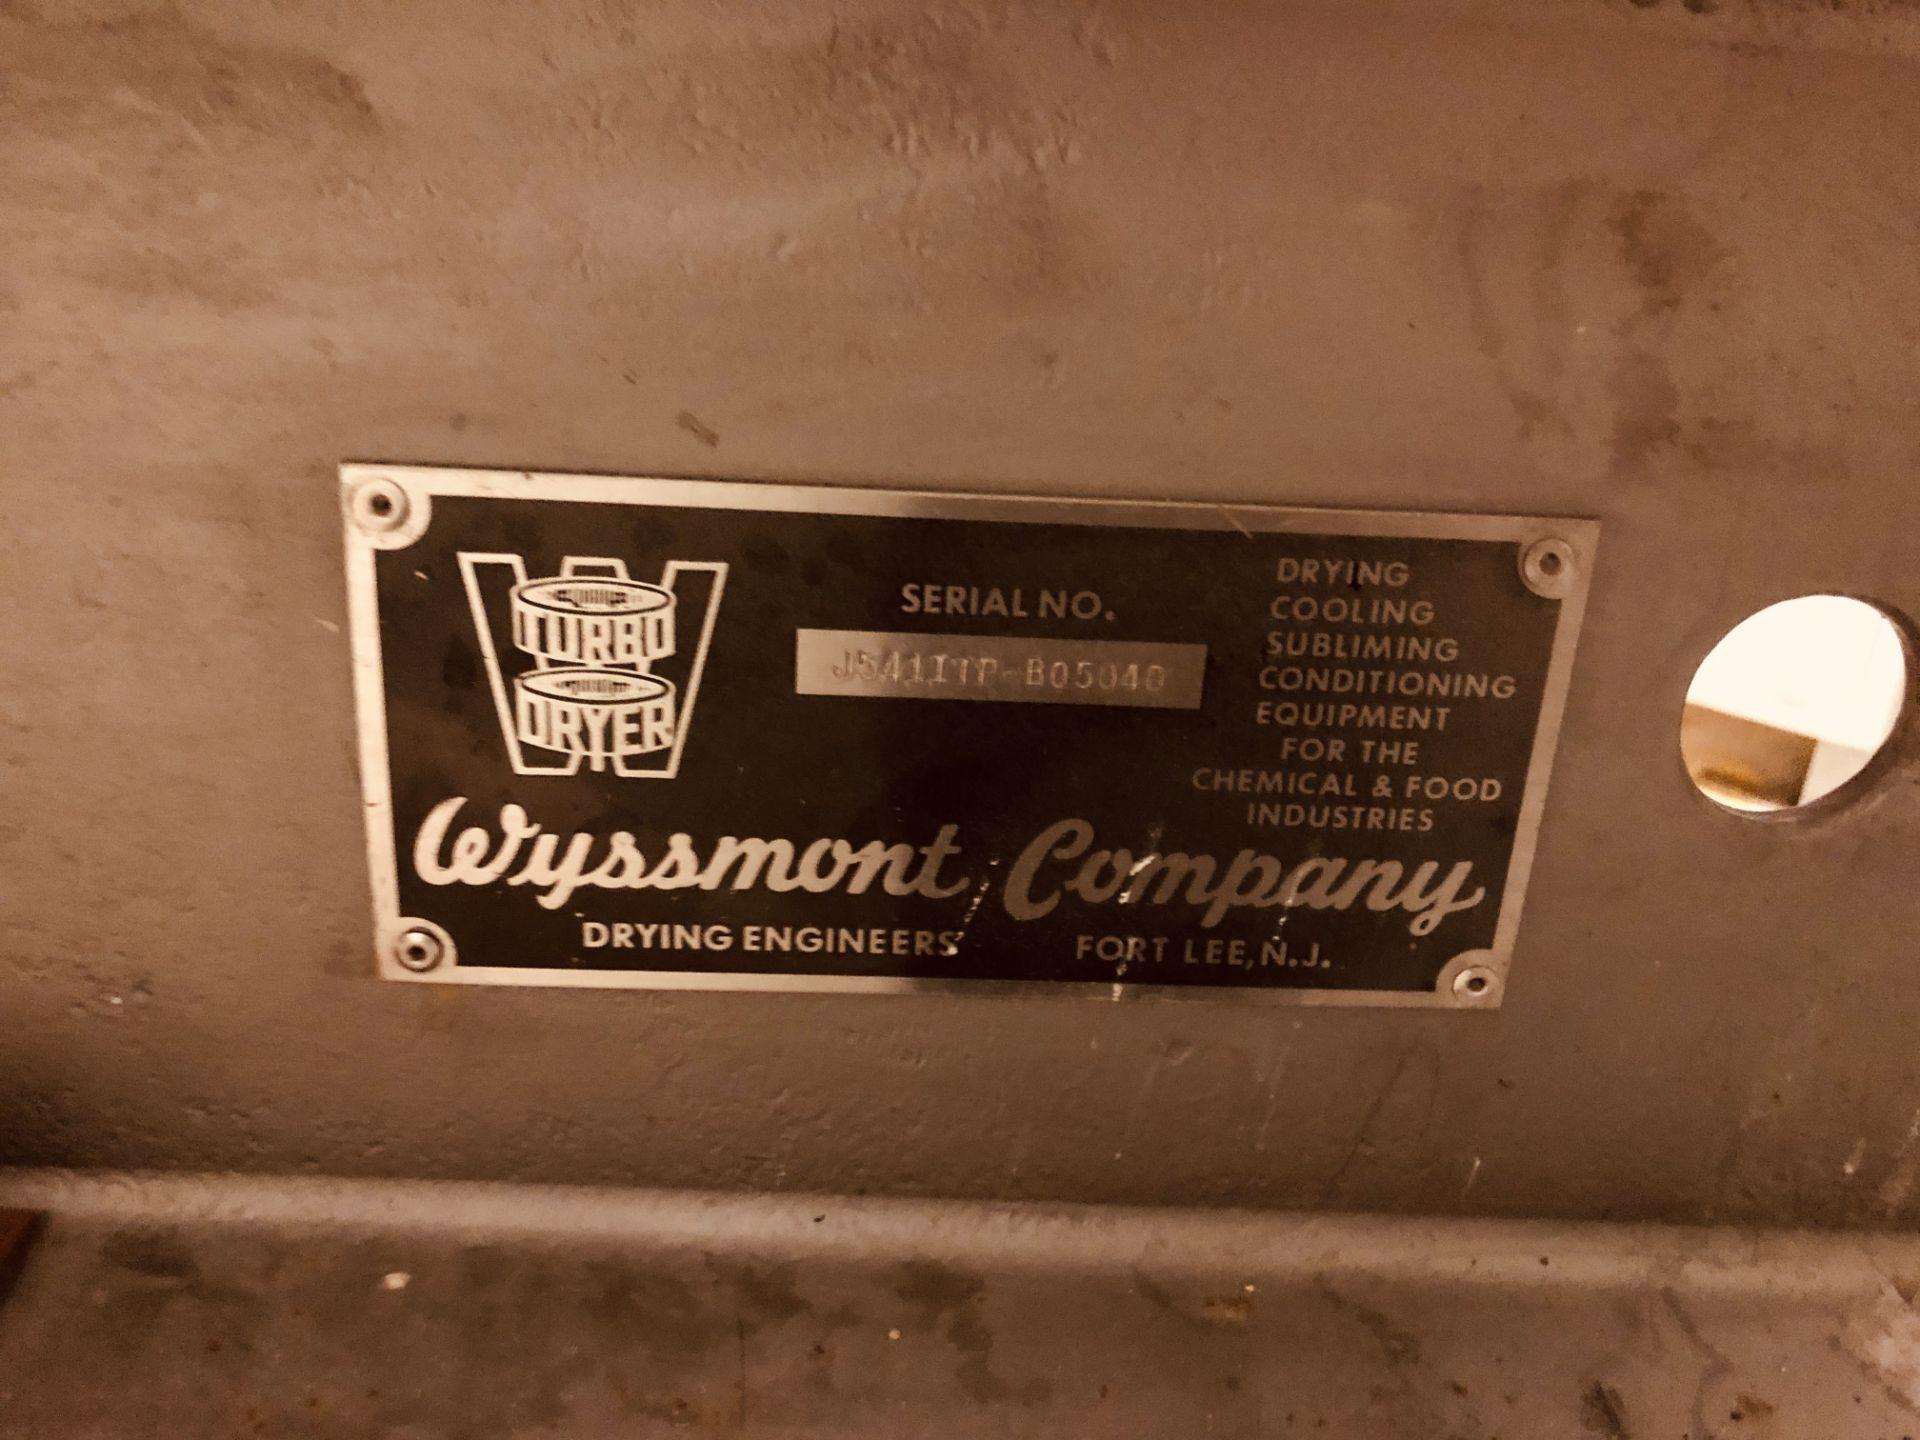 Wyssmont Model OE-32 Turbo Dryer - Includes Blower & Rotary Air Locks - Image 3 of 6